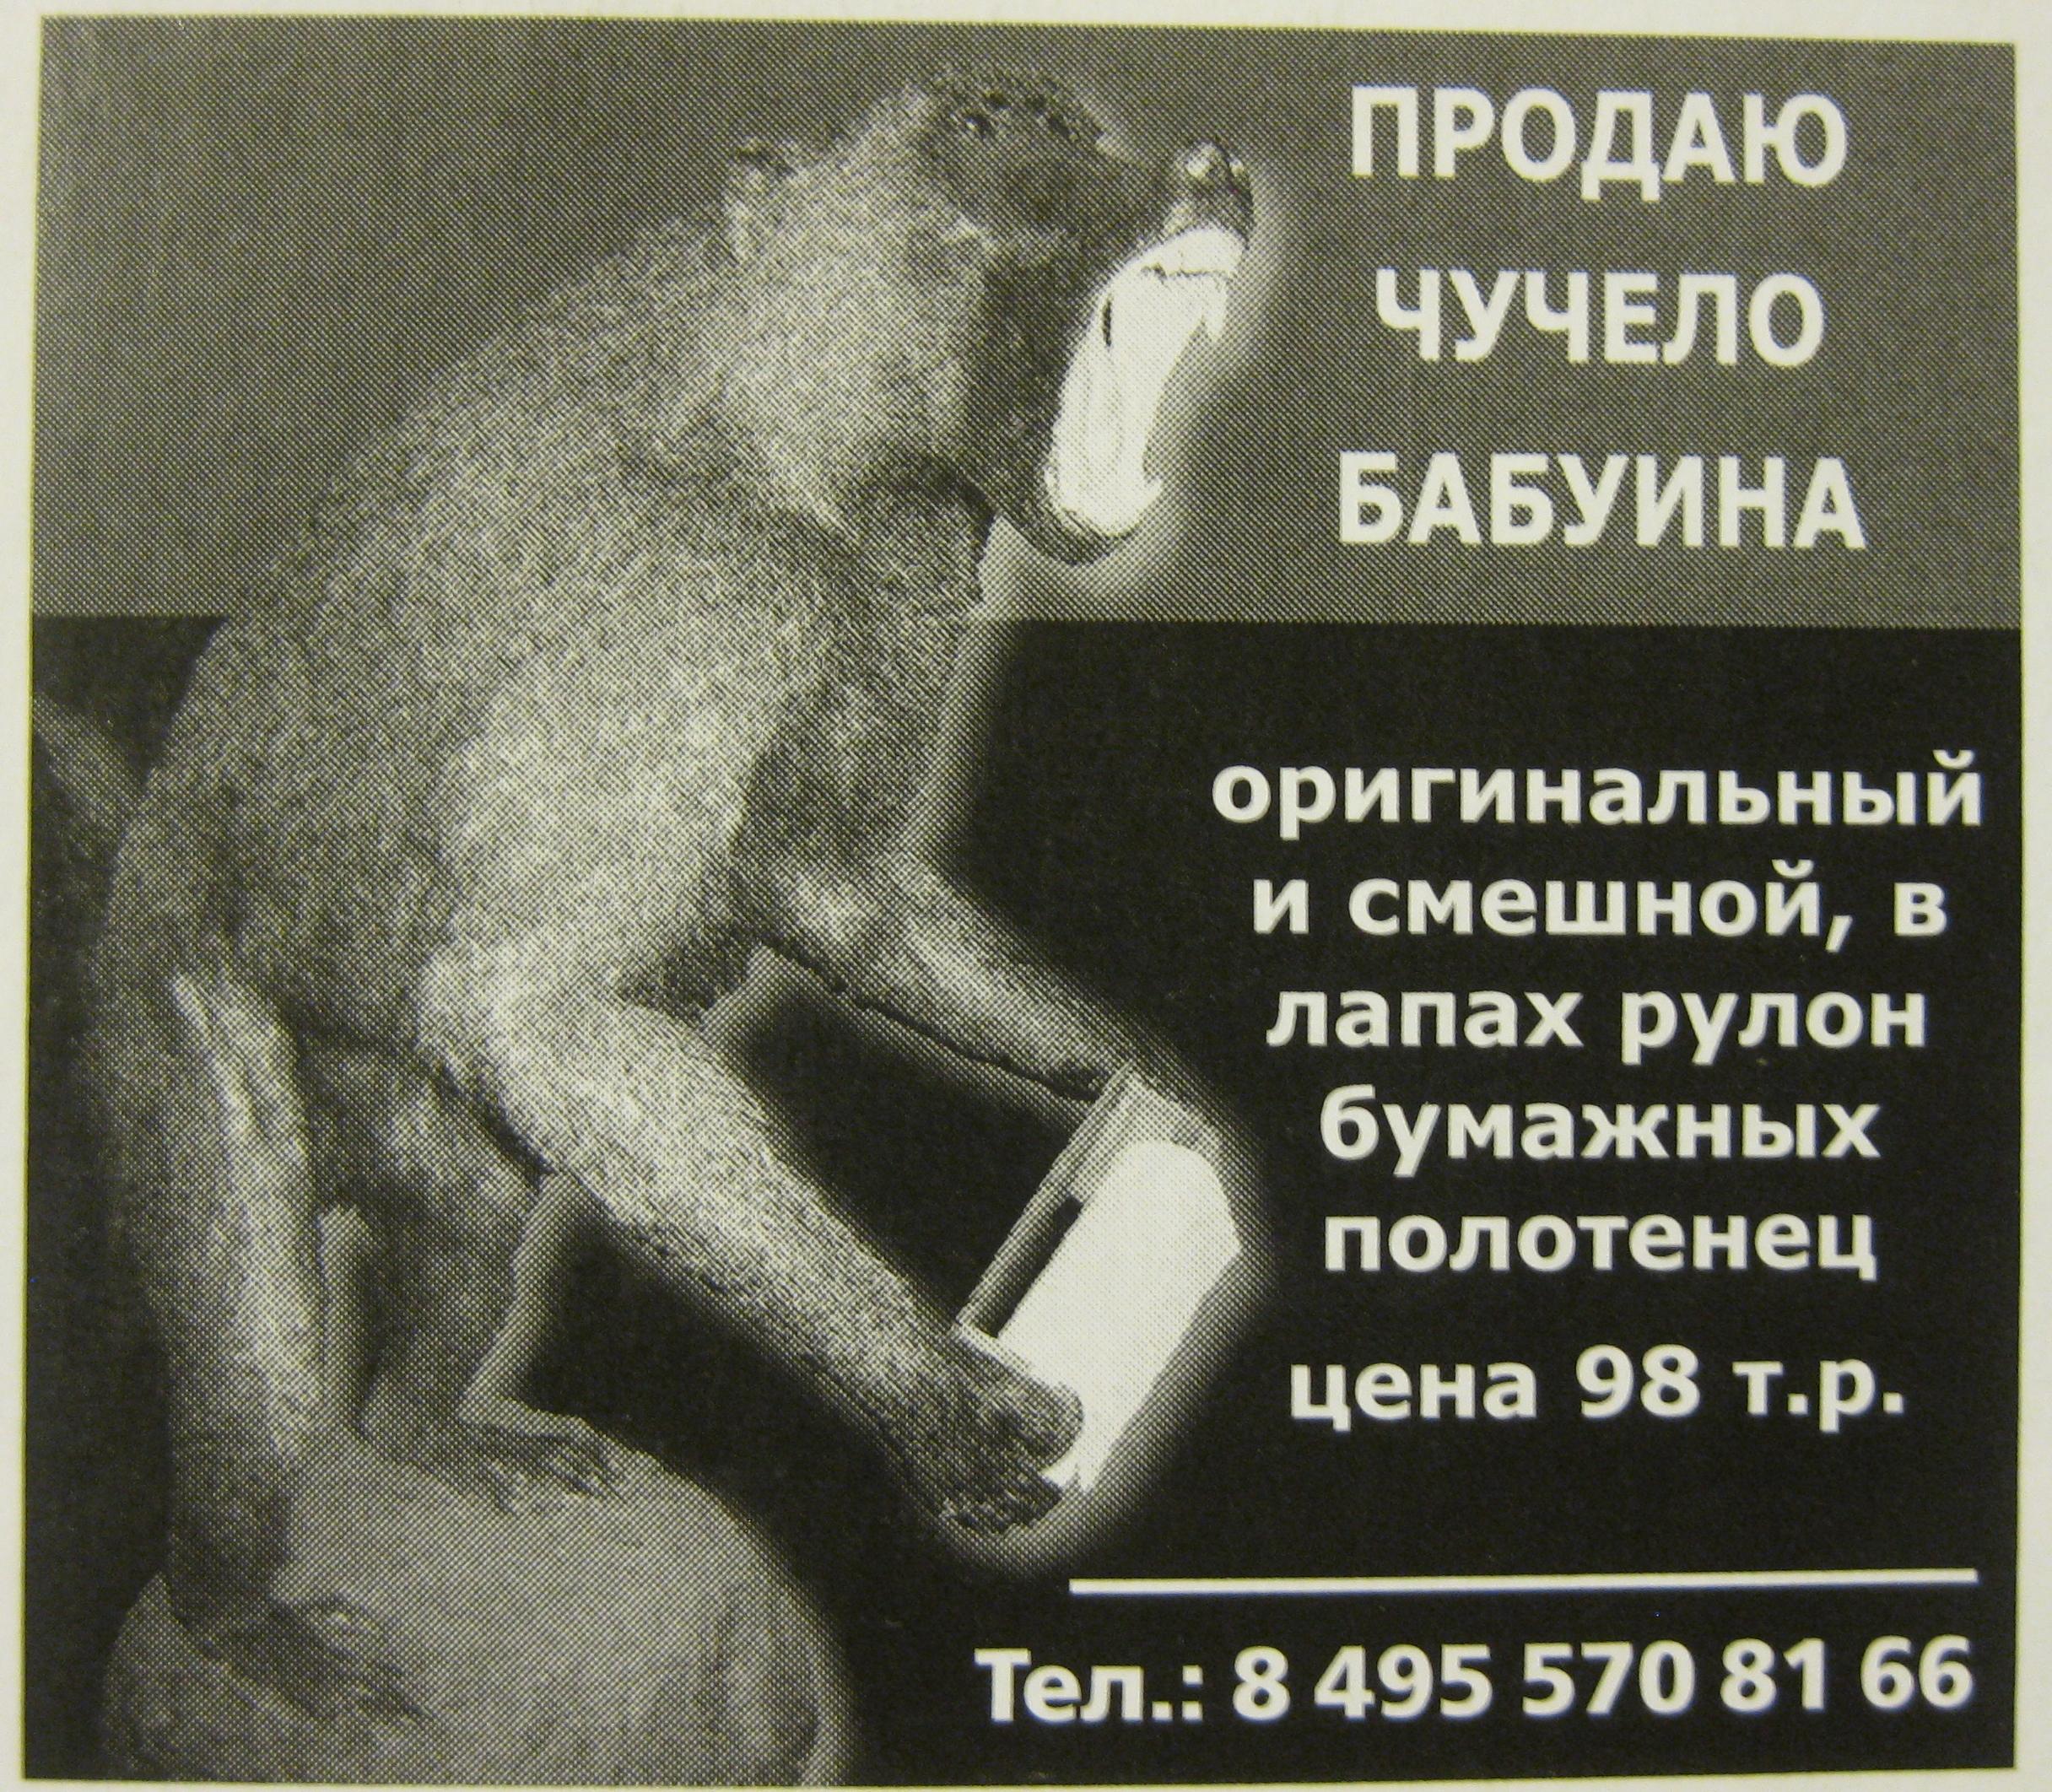 http://std3.ru/c1/48/1422805797-c1482db2a358f7b00039b7a9e7fc686f.JPG